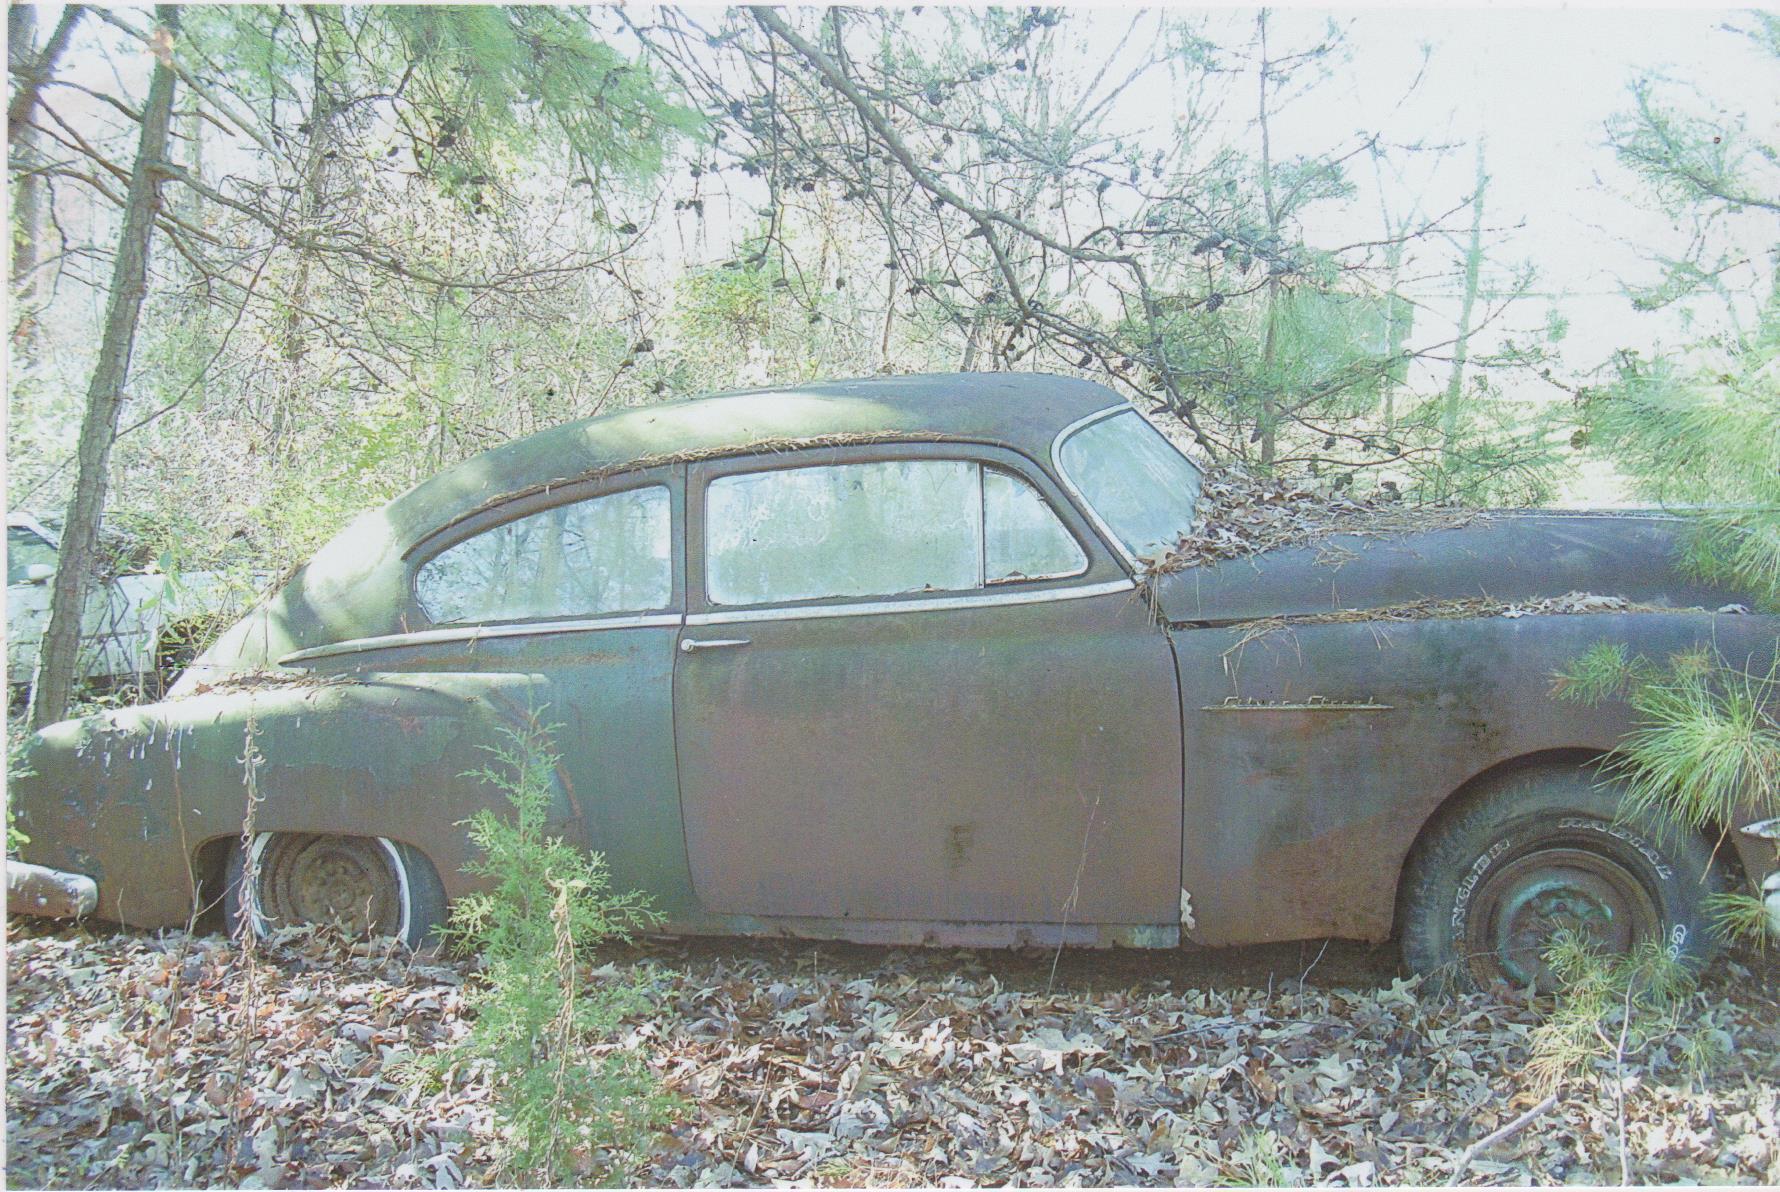 Click image for larger version  Name:Pontiac Silver Streak 001.jpg Views:74 Size:445.0 KB ID:75815